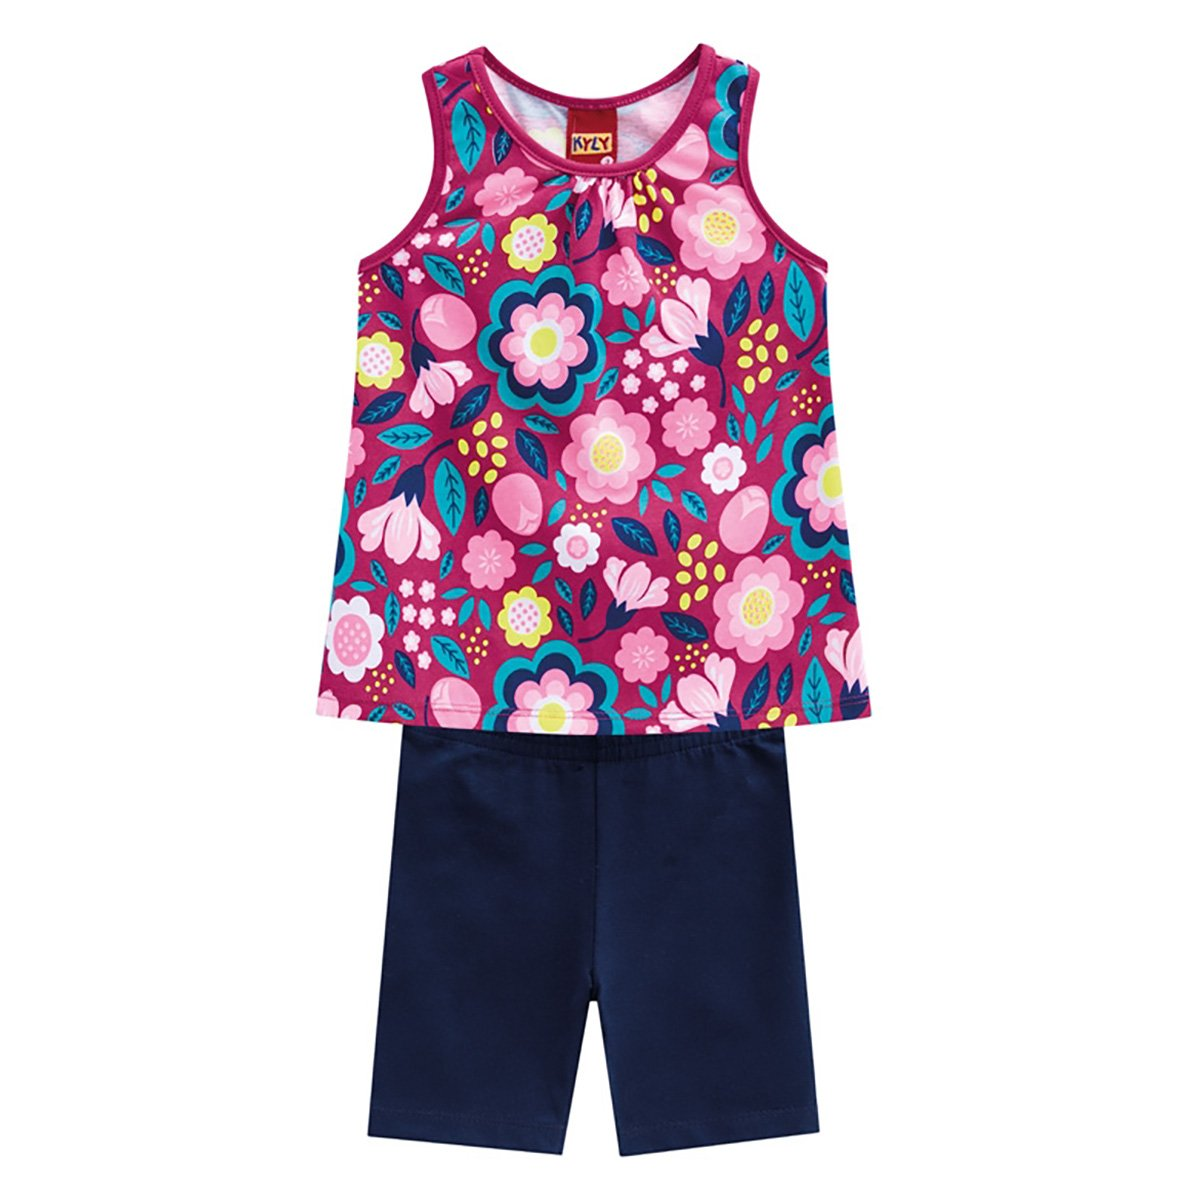 Conjunto Infantil Kyly Floral Feminino